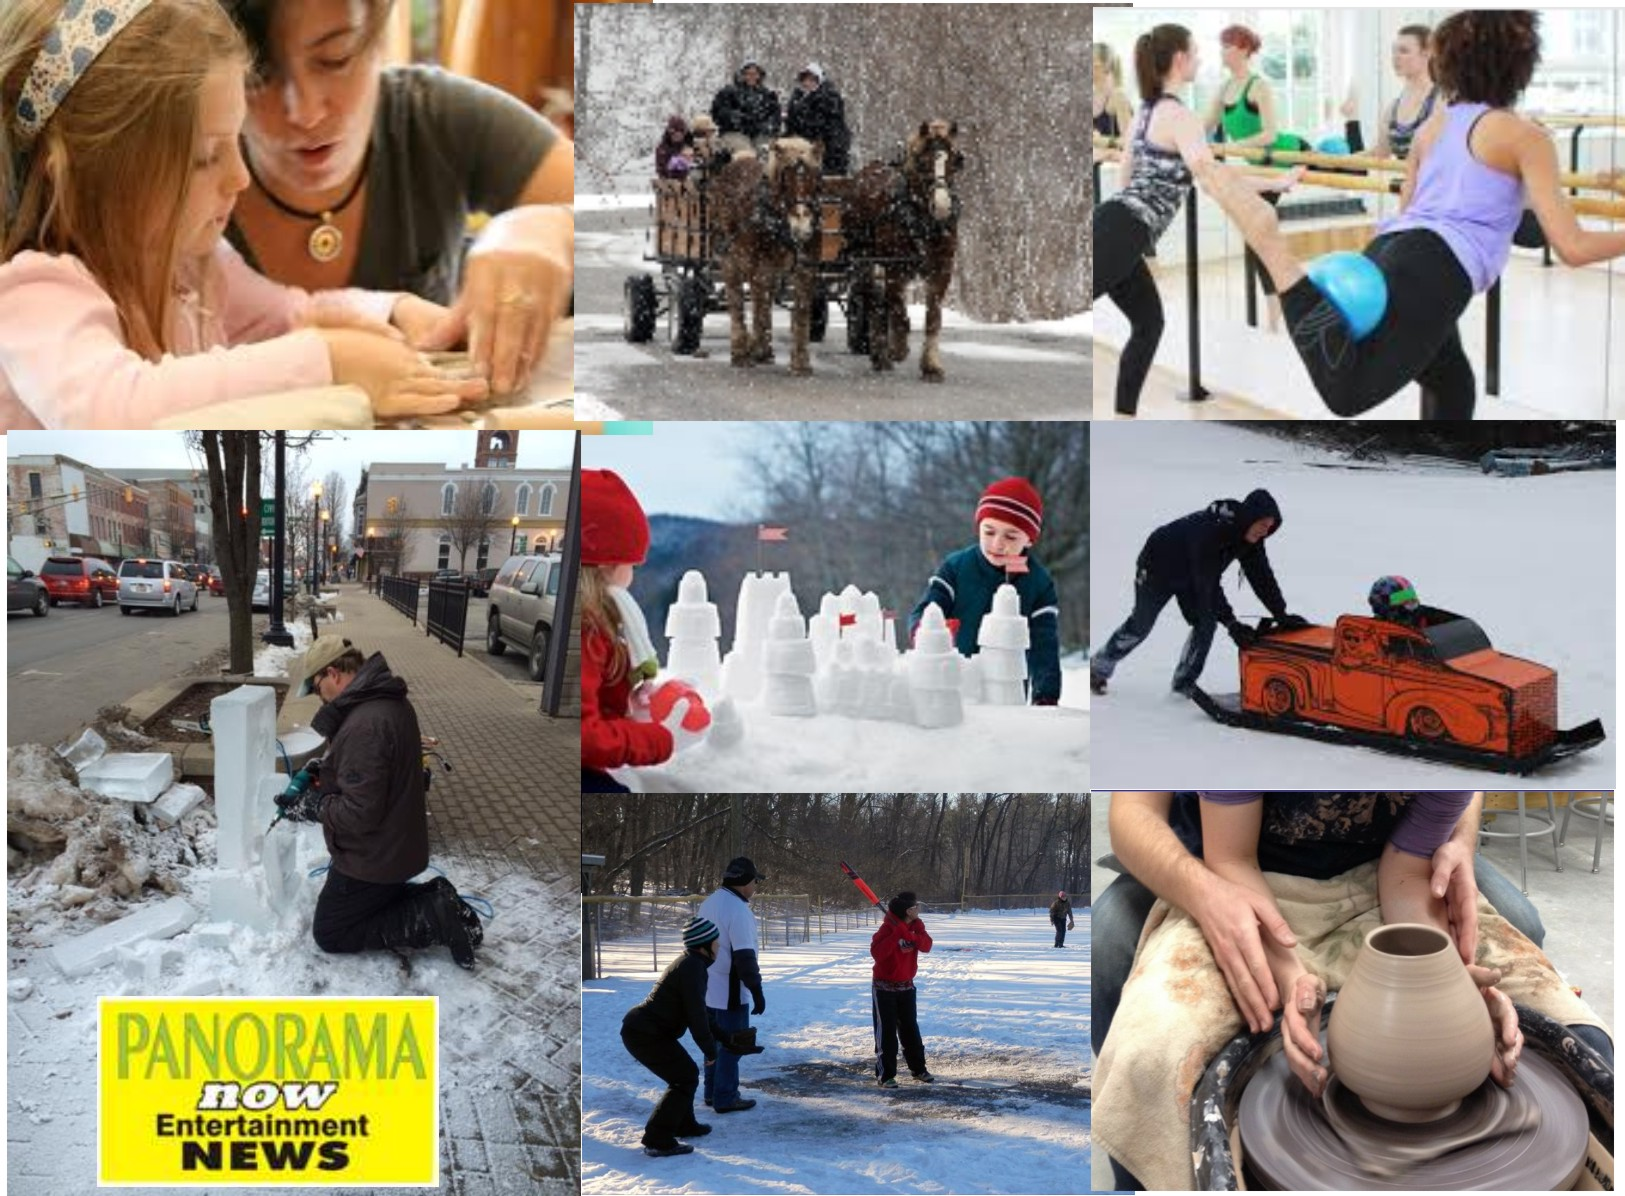 laporte winter fest 2018